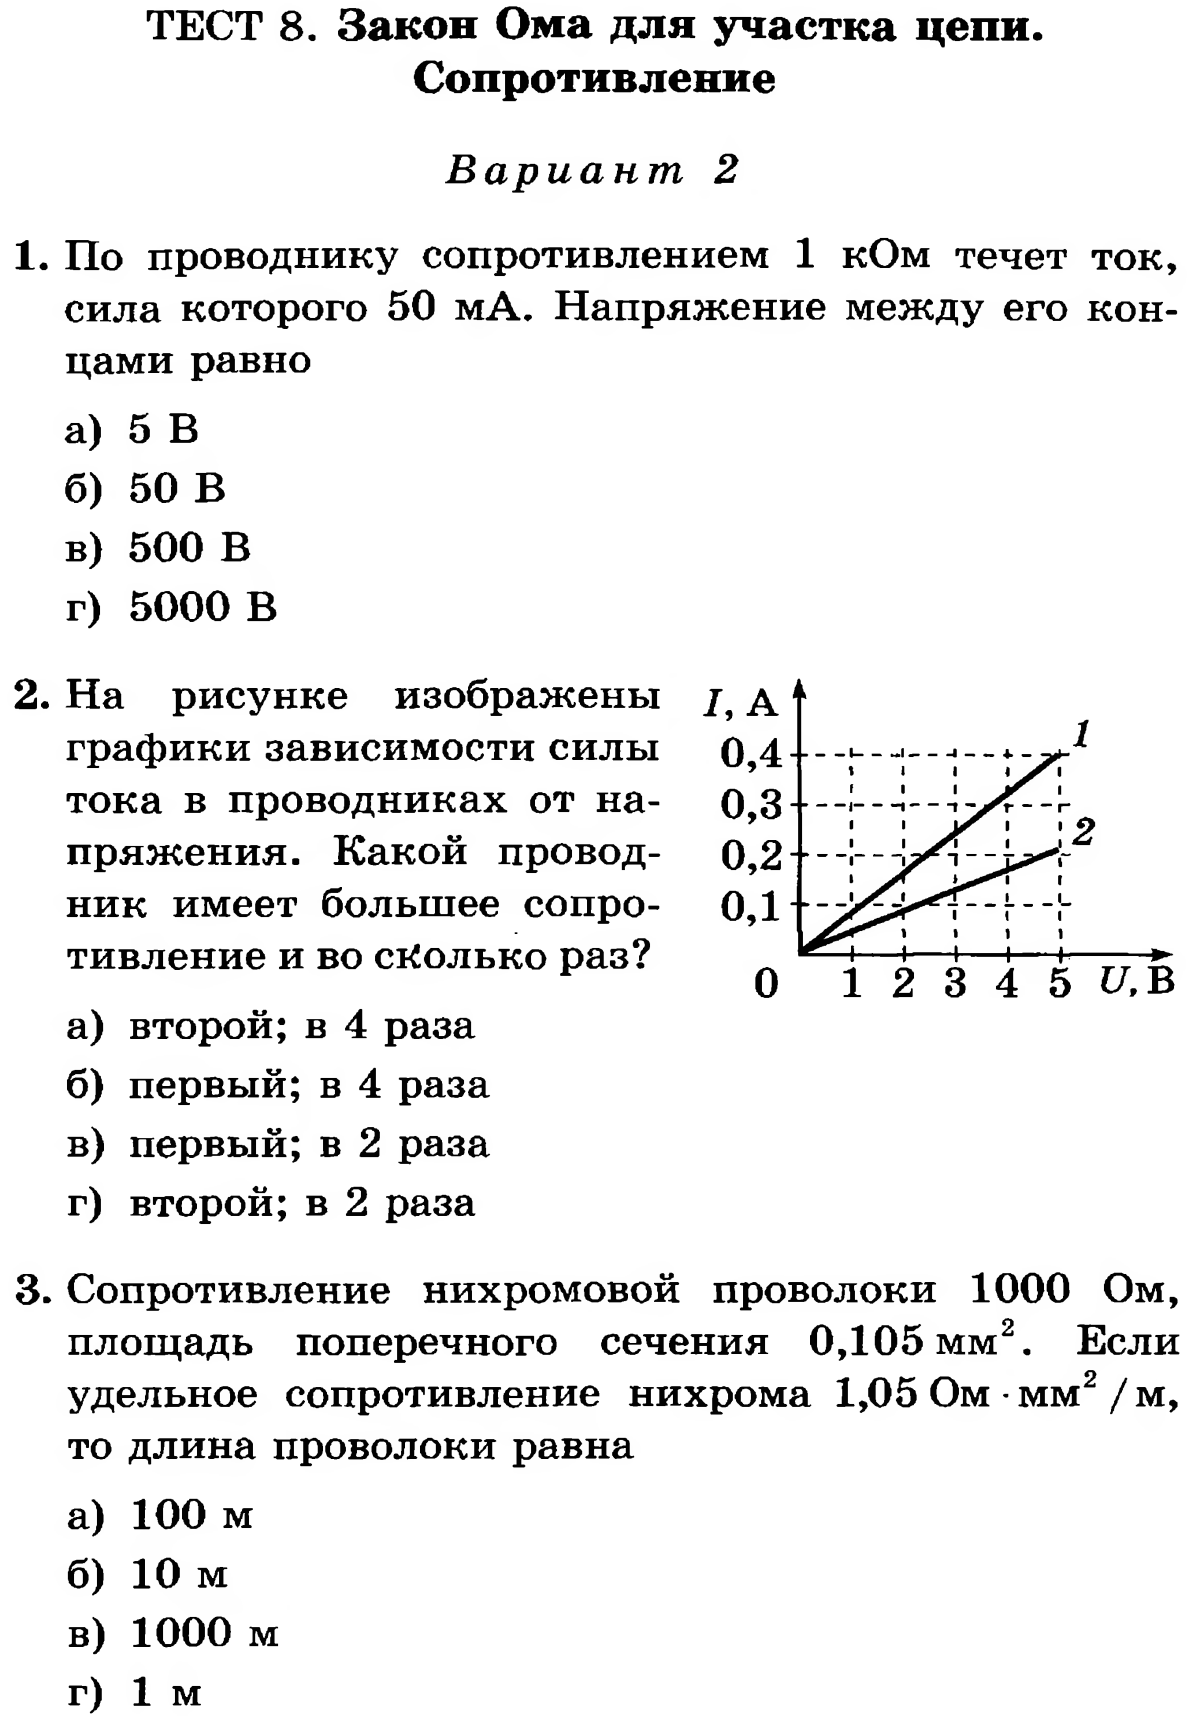 https://fsd.multiurok.ru/html/2018/03/13/s_5aa7a253057ba/857111_2.png